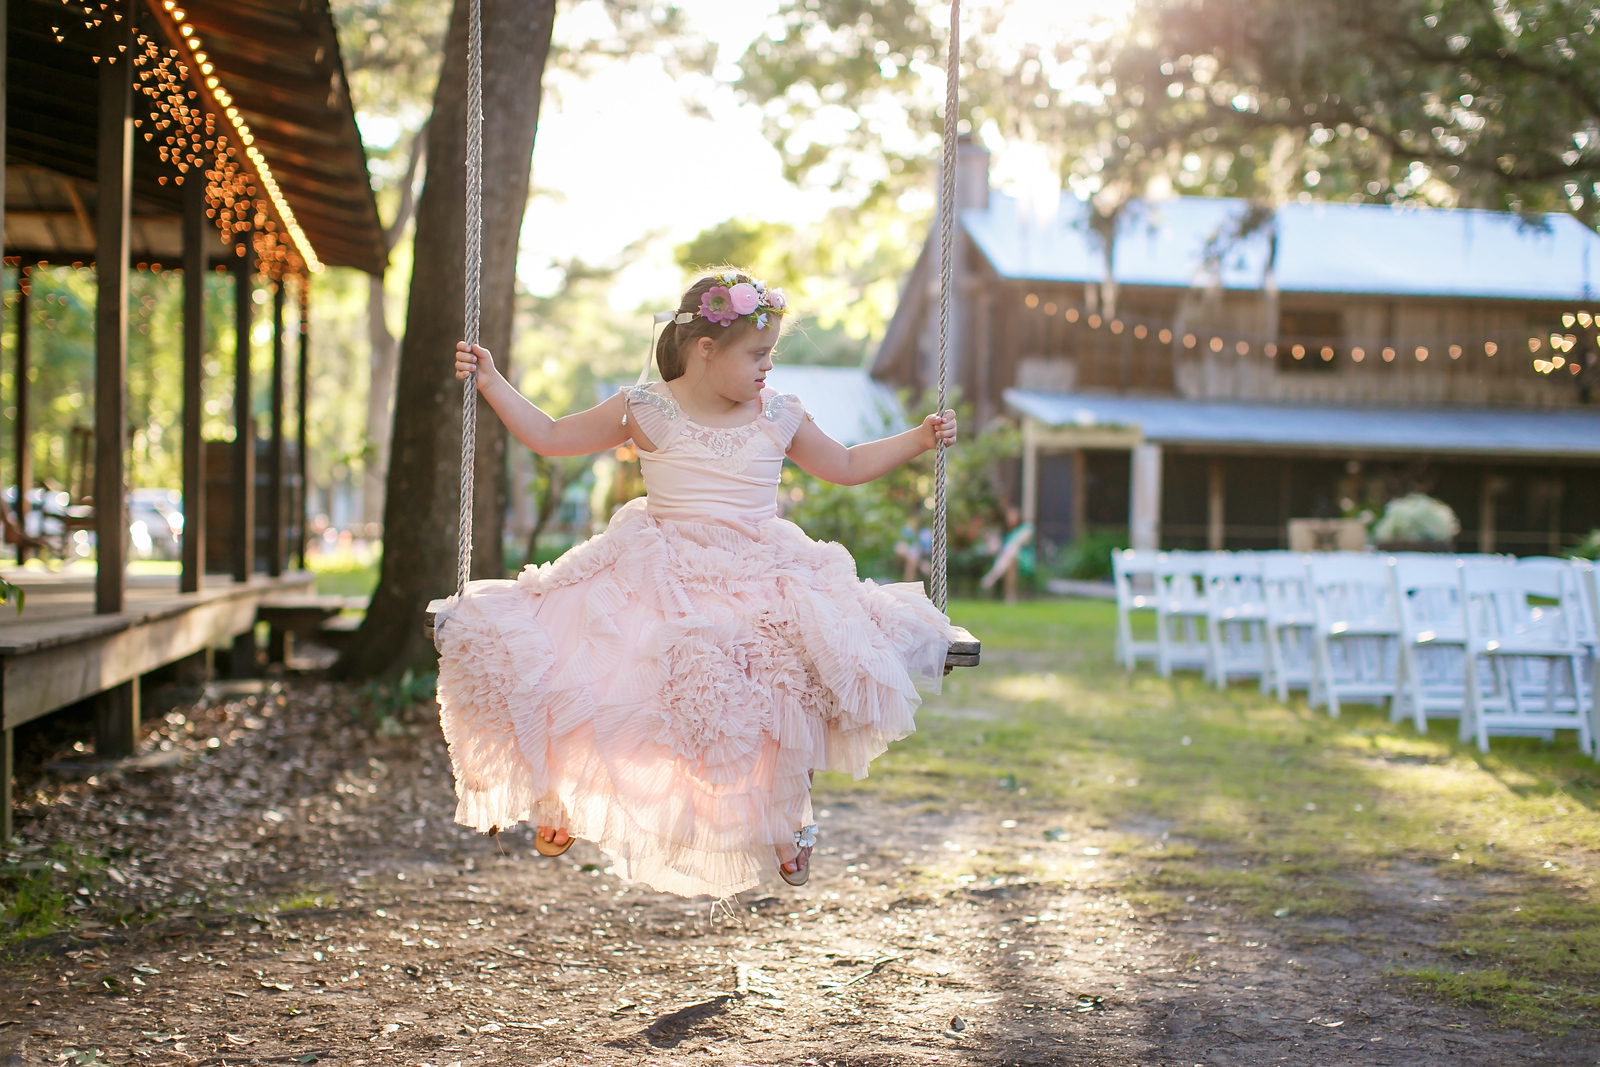 CAP2017-MadisonKyle-WEDDING-Giselle-TuckersFarmhouse-1007